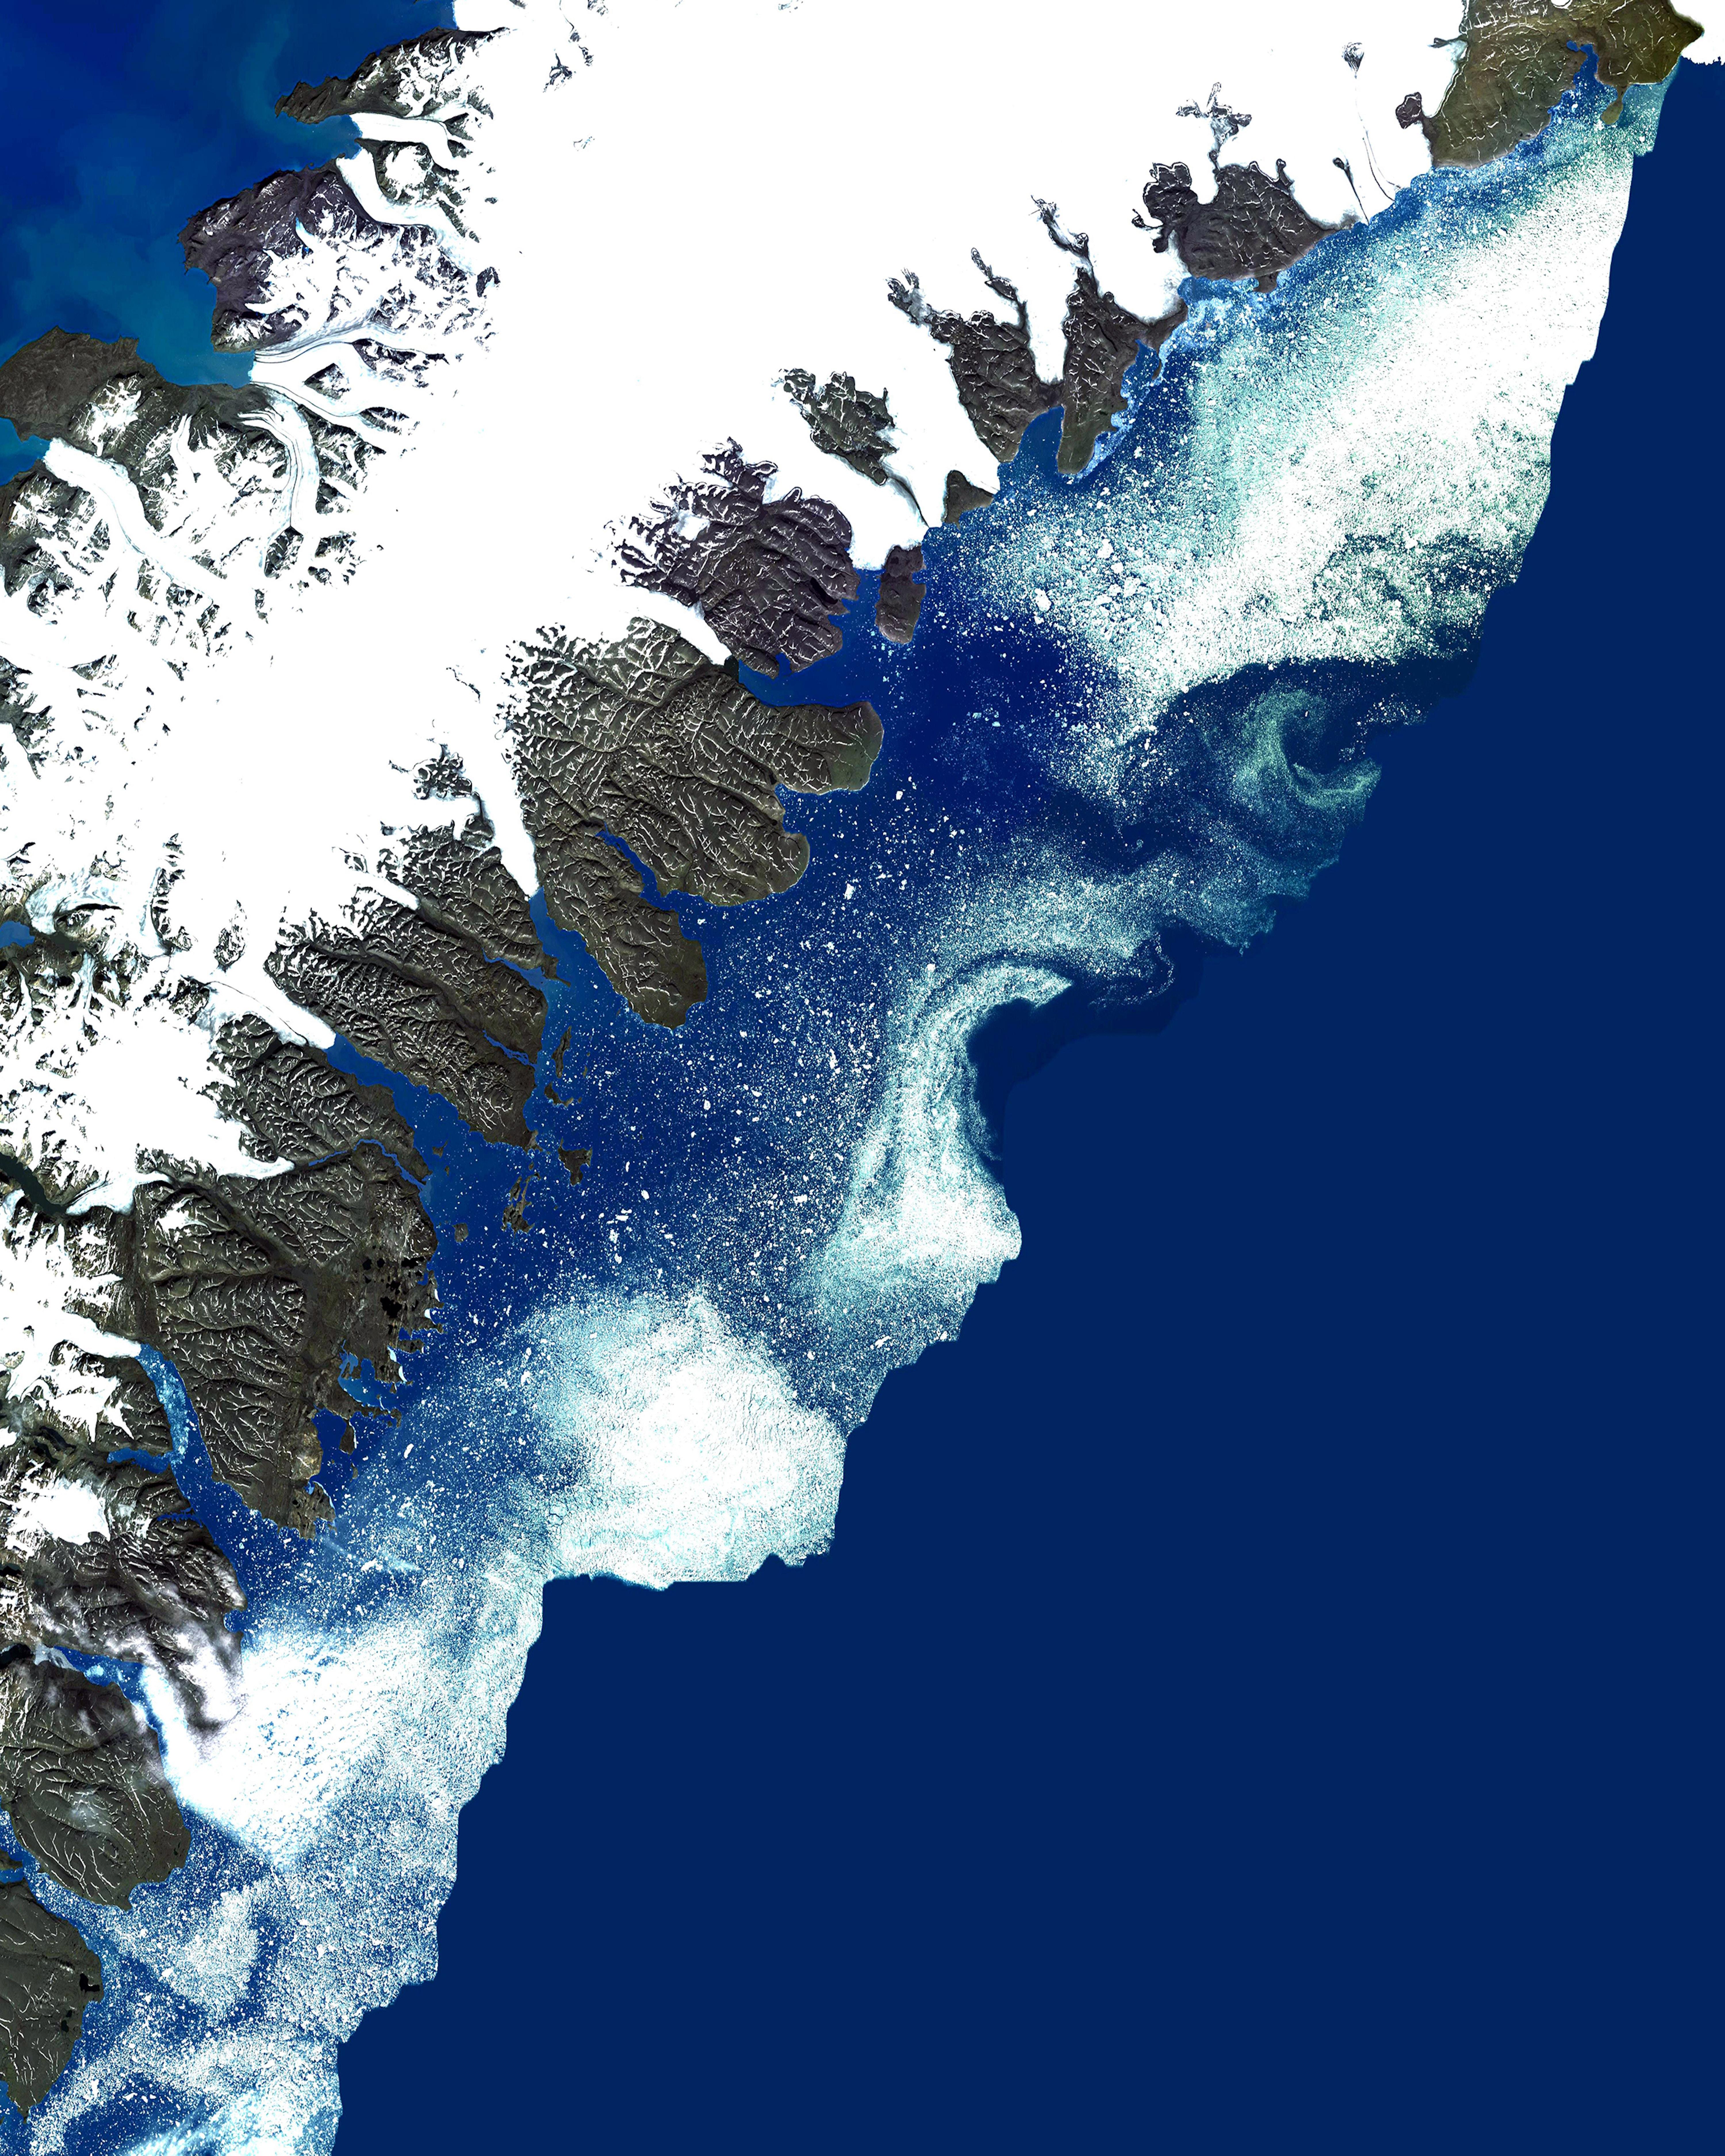 Severny Island Ice